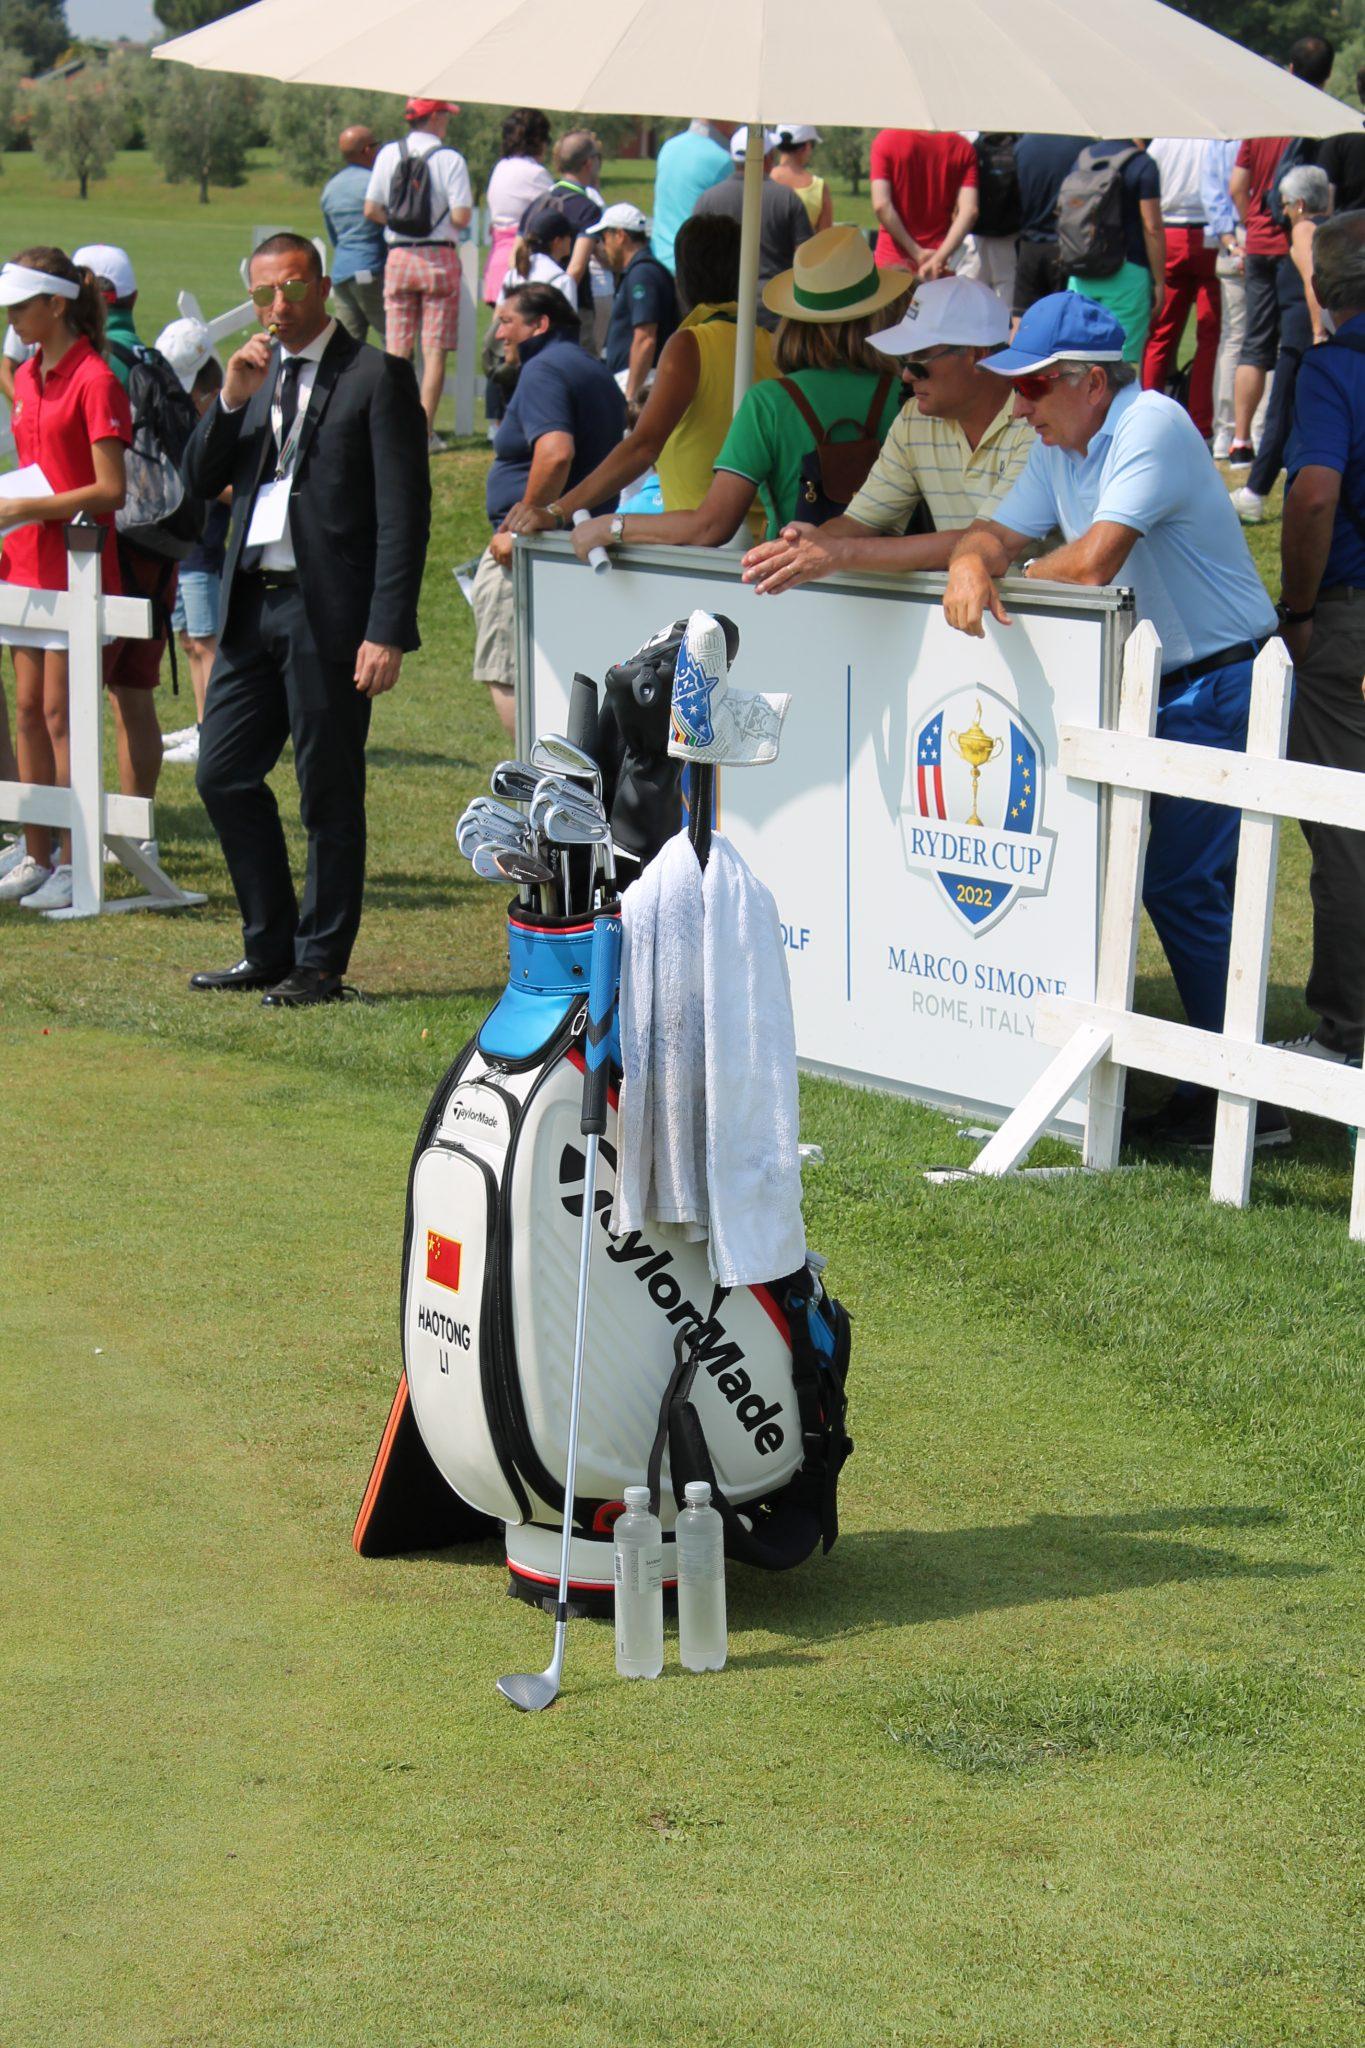 Haotong Li's golf bag